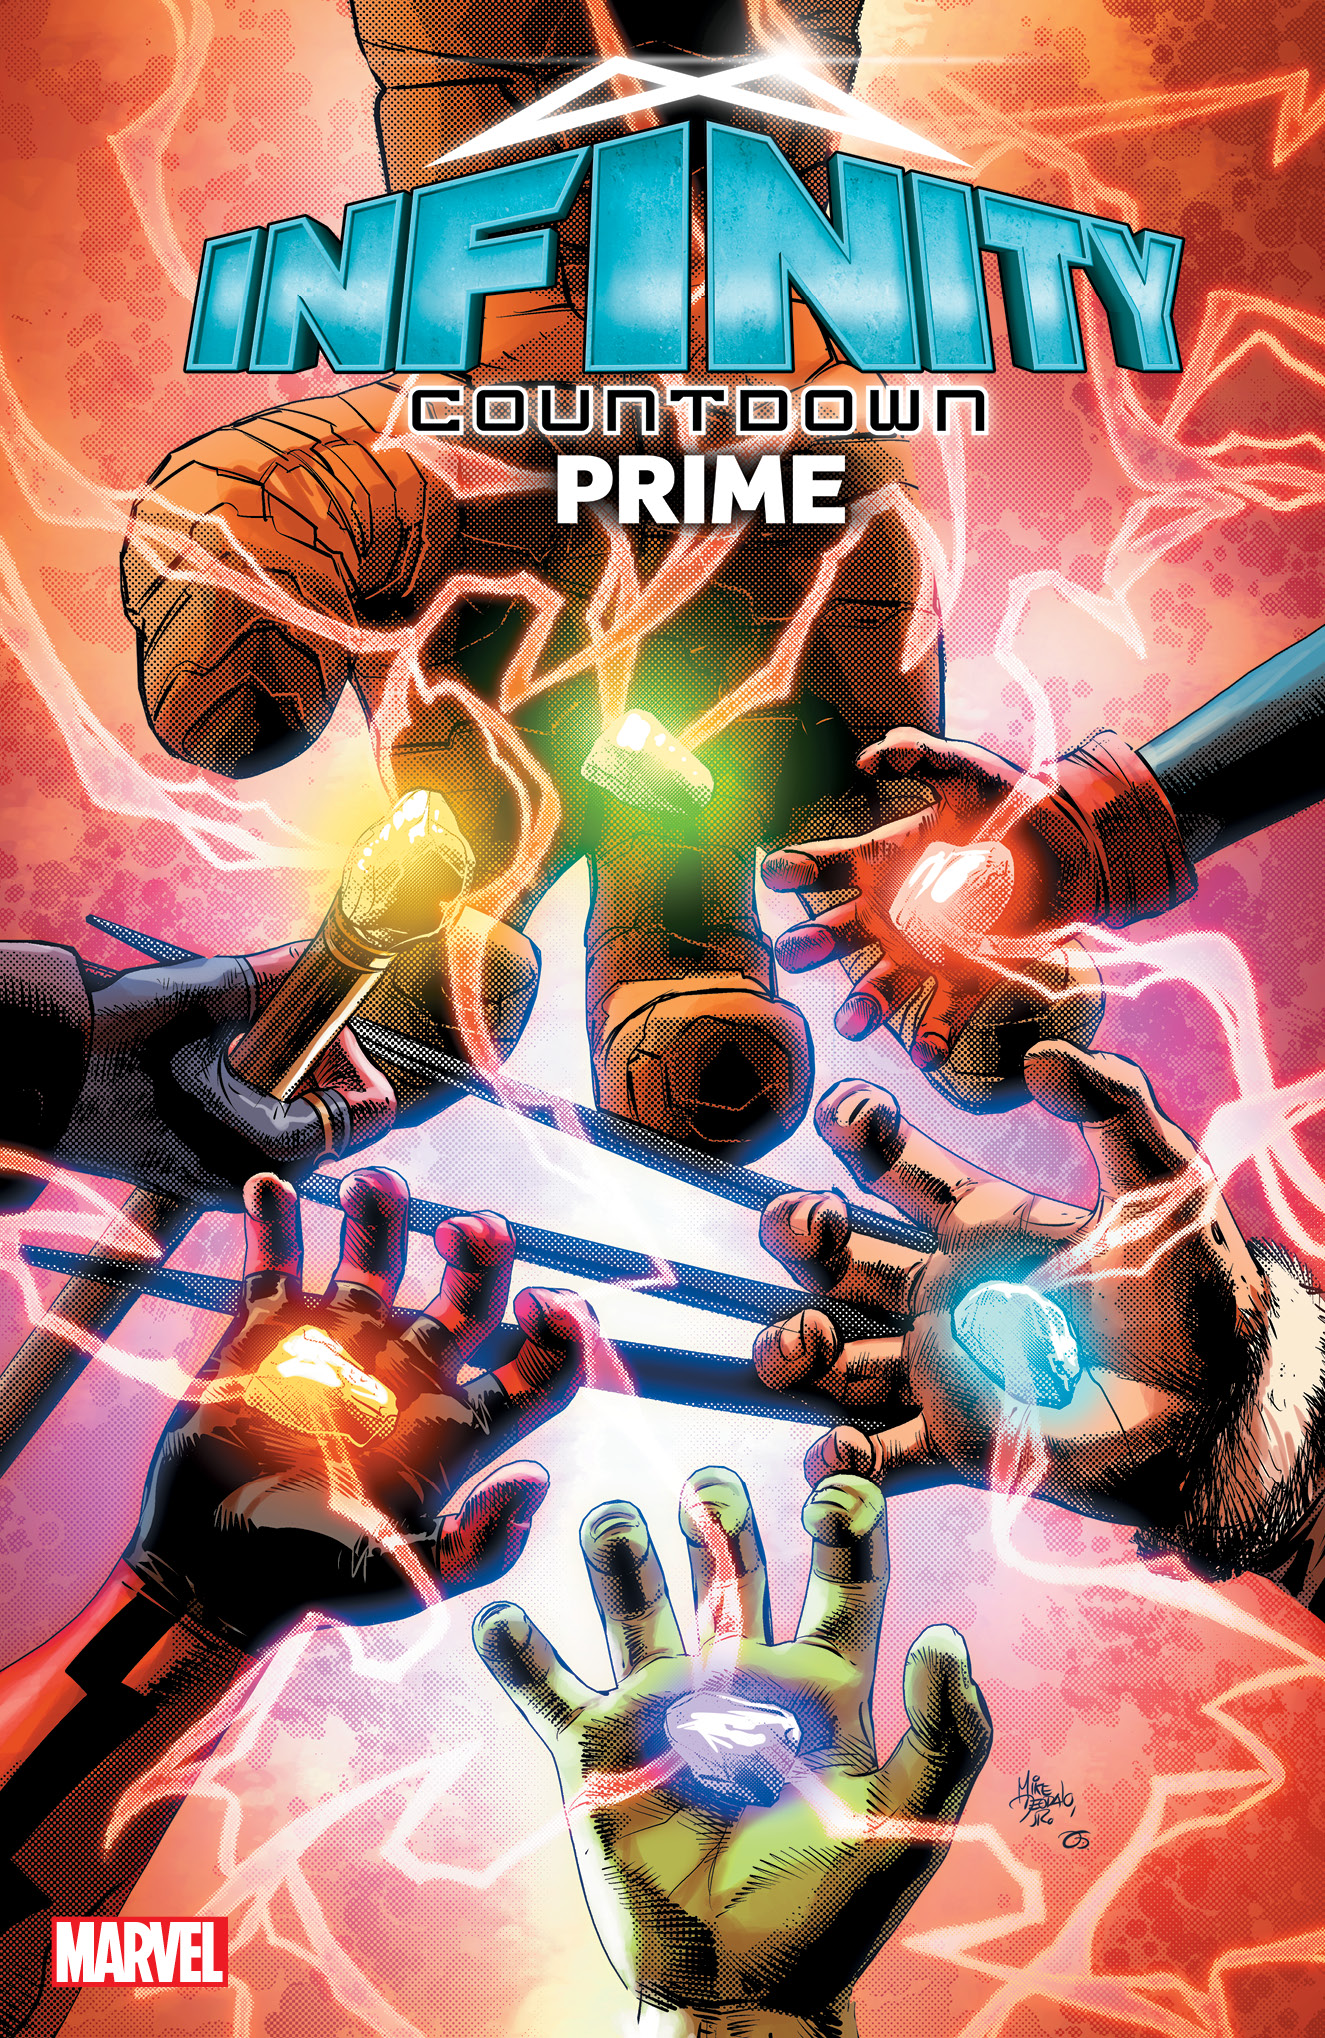 Infinity Countdown Prime #1